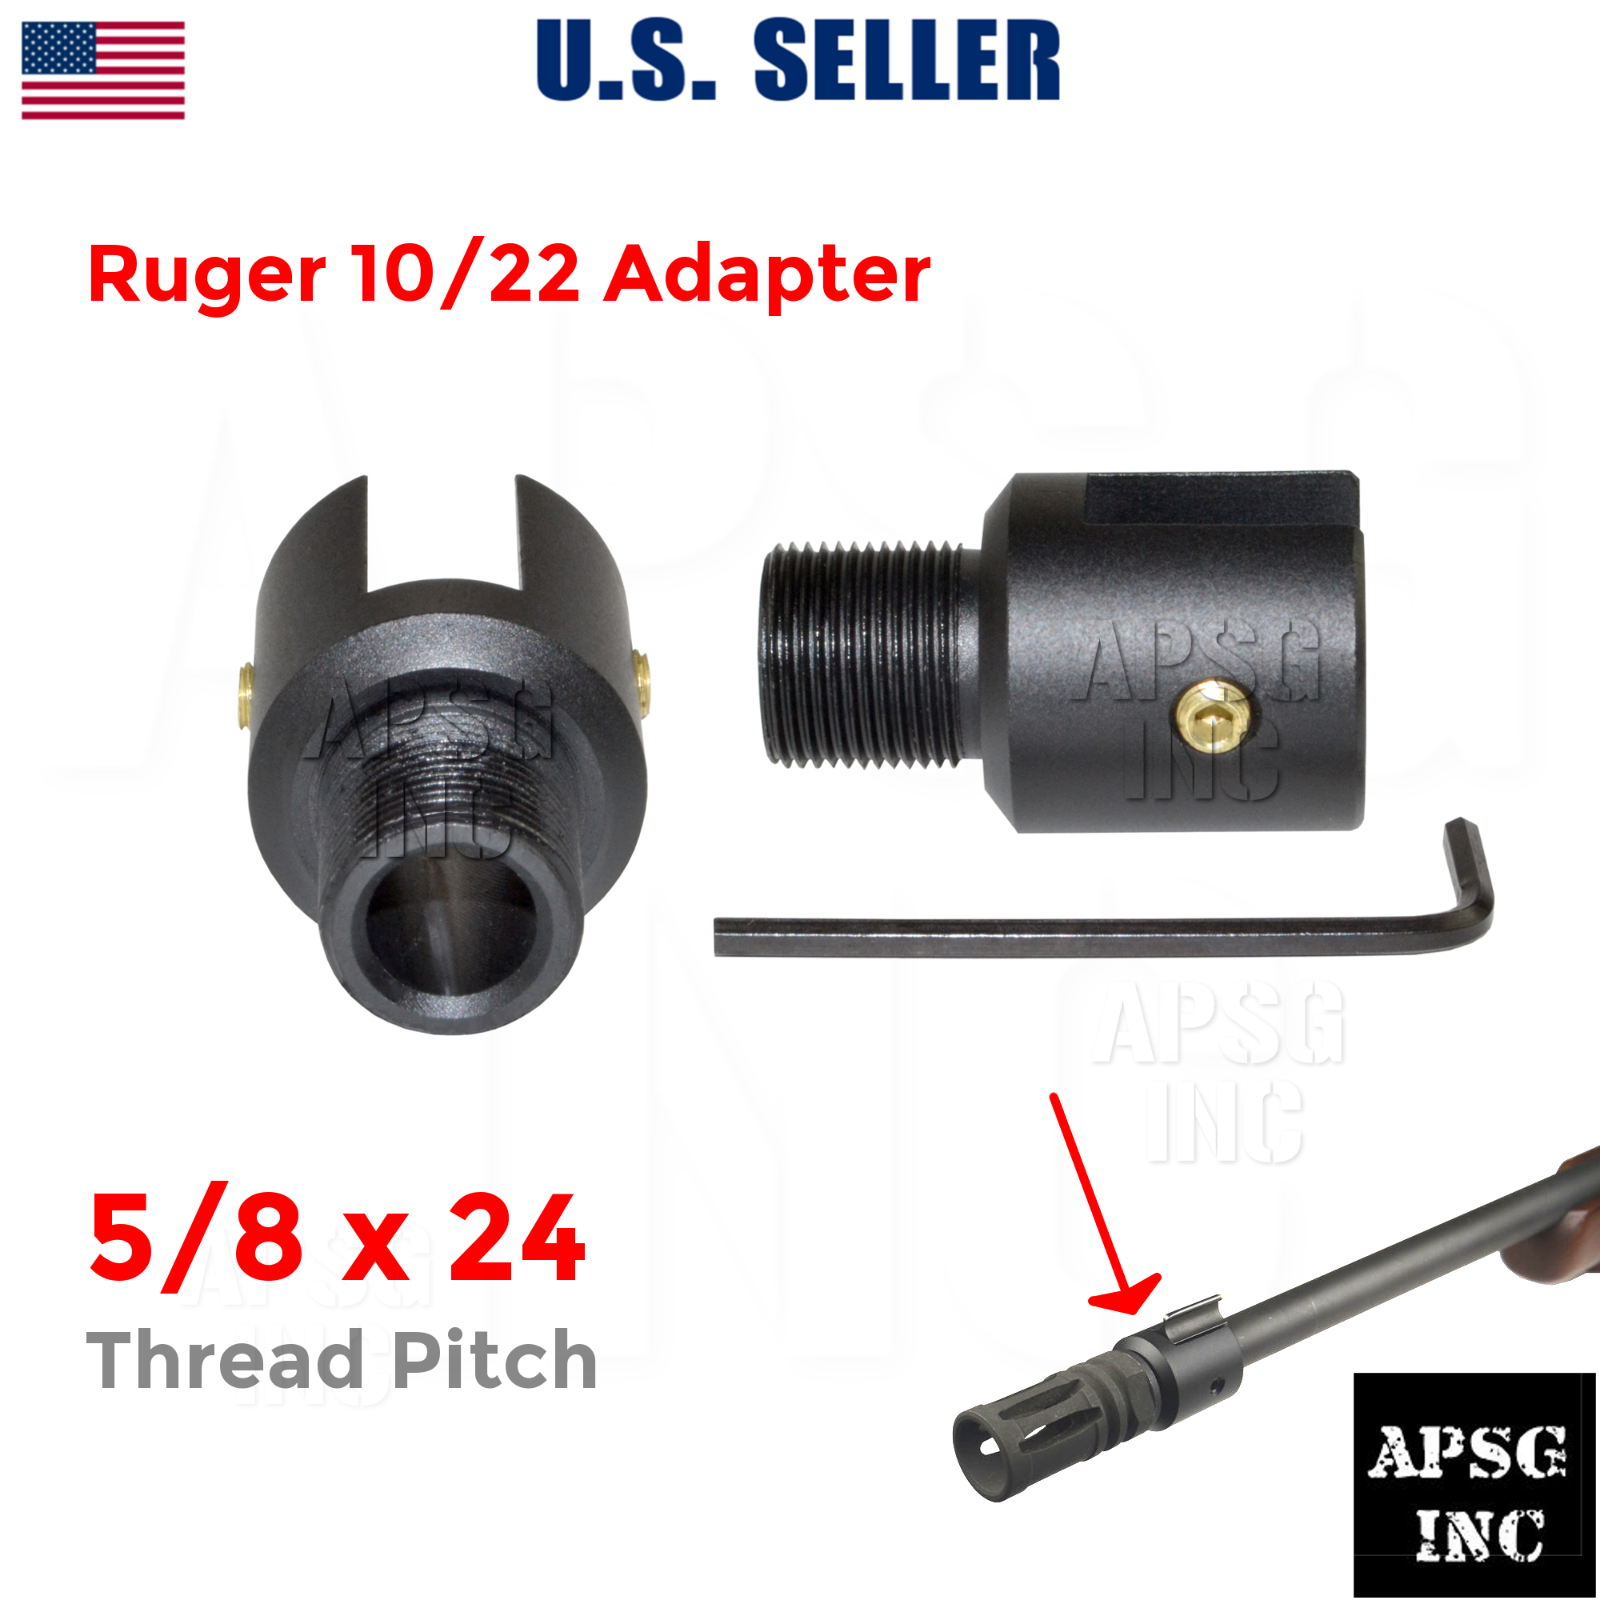 U.S SELLER Aluminum Ruger 1022 10-22 Muzzle Brake Adapter 1//2-28 Thread